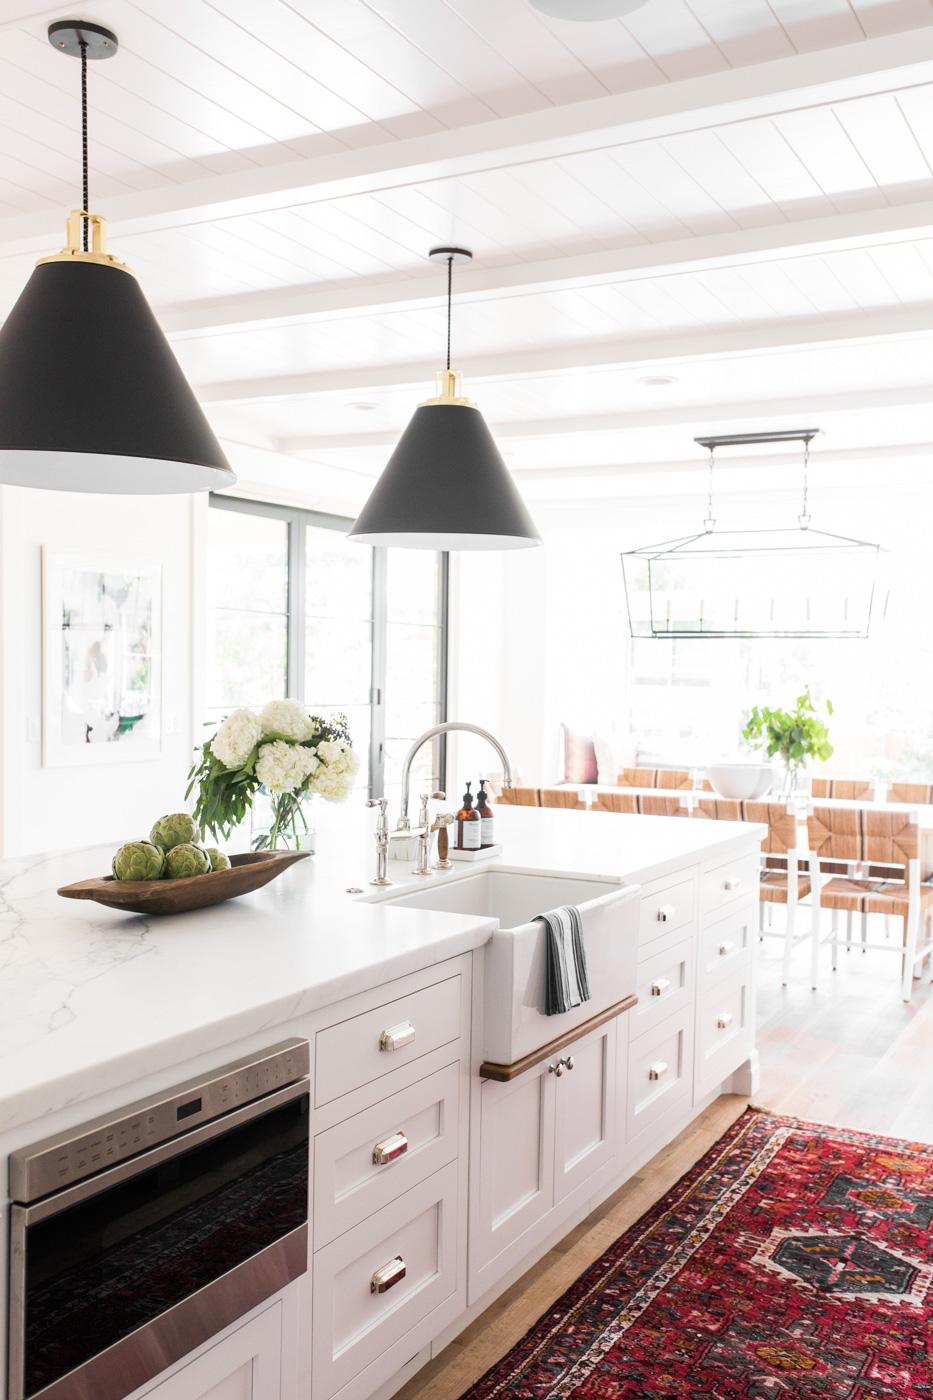 Modern+farmhouse+meets+The+Hamptons+in+Studio+McGee's+latest+remodel+||+vintage+kitchen+rug,+black+cone+pendants,+marble+counters,+farmhouse+sink,+bridge+faucet.jpg